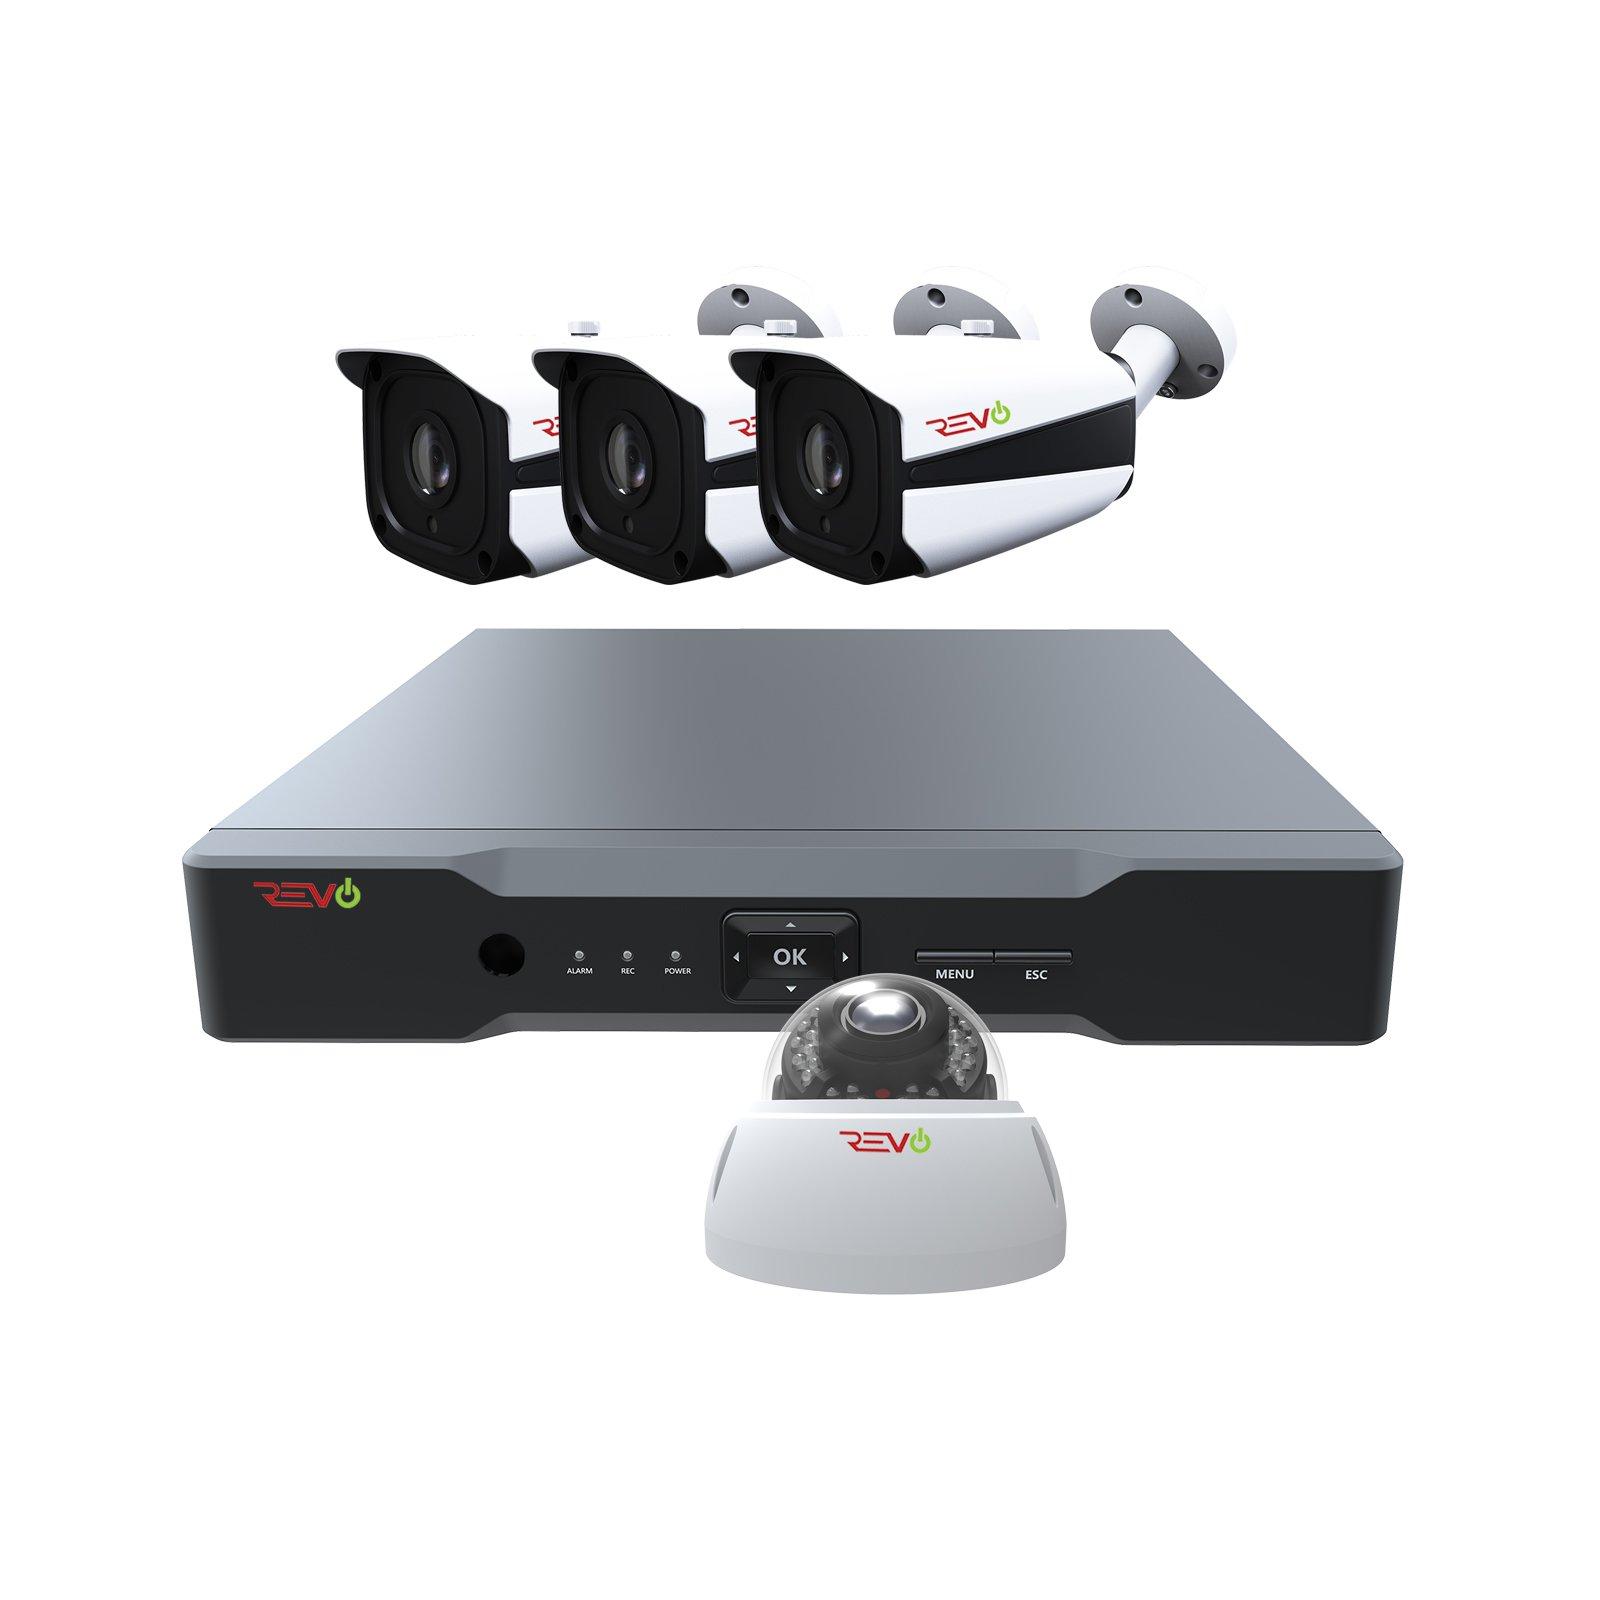 Revo America AeroHD 8Ch. 5MP DVR, 1TB HDD Video Security System, 3 x 5 MP IR Bullet Cameras, 1 x 5 MP IR Vandal Dome Camera Indoor/Outdoor - Remote Access via Smart Phone, Tablet, PC & MAC